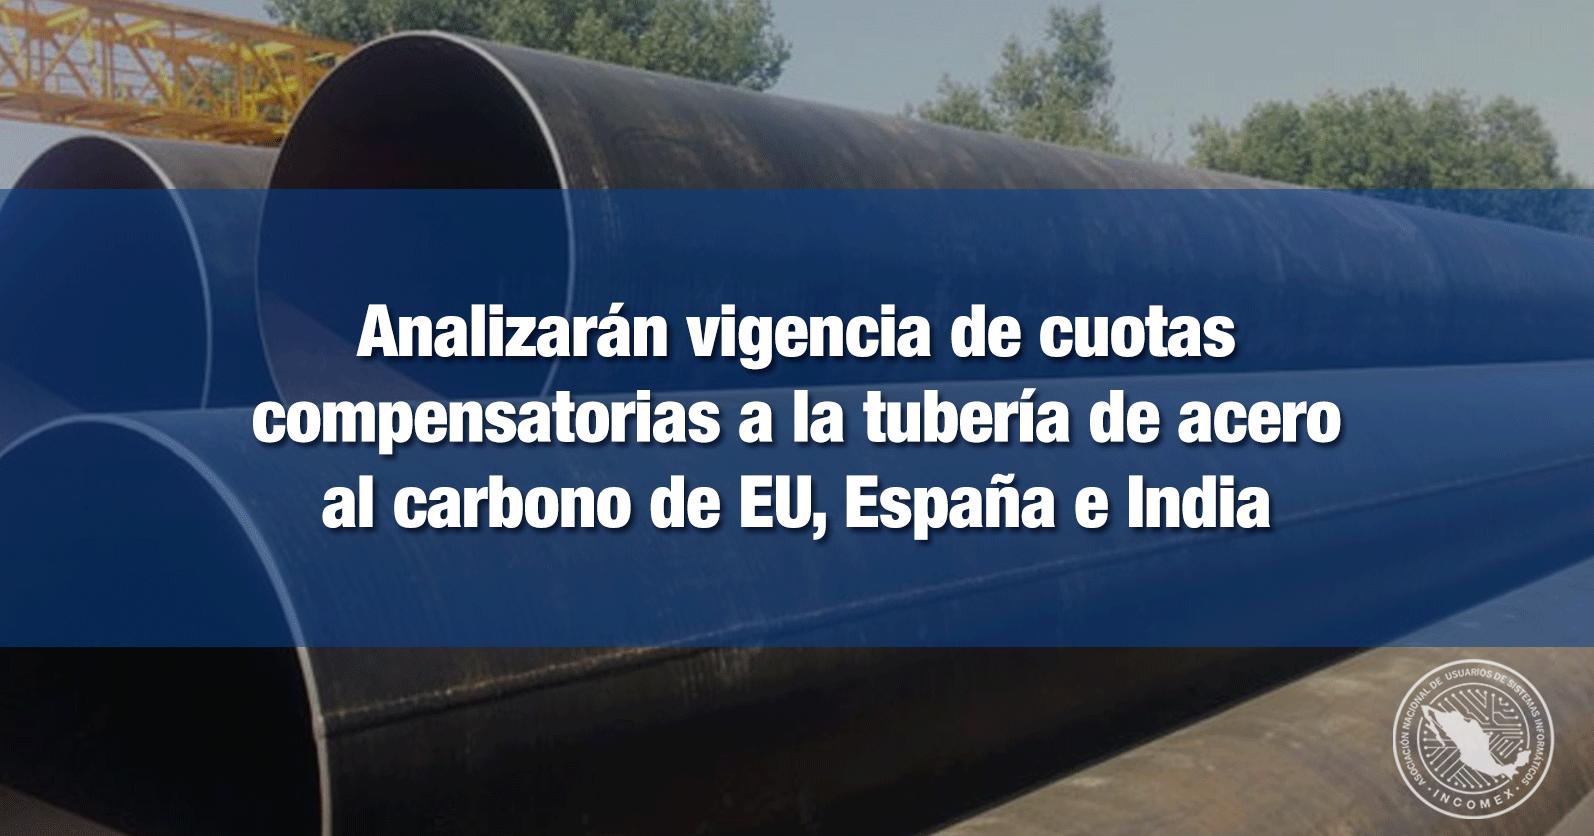 Analizarán vigencia de cuotas compensatorias a la tubería de acero al carbono de EU, España e India